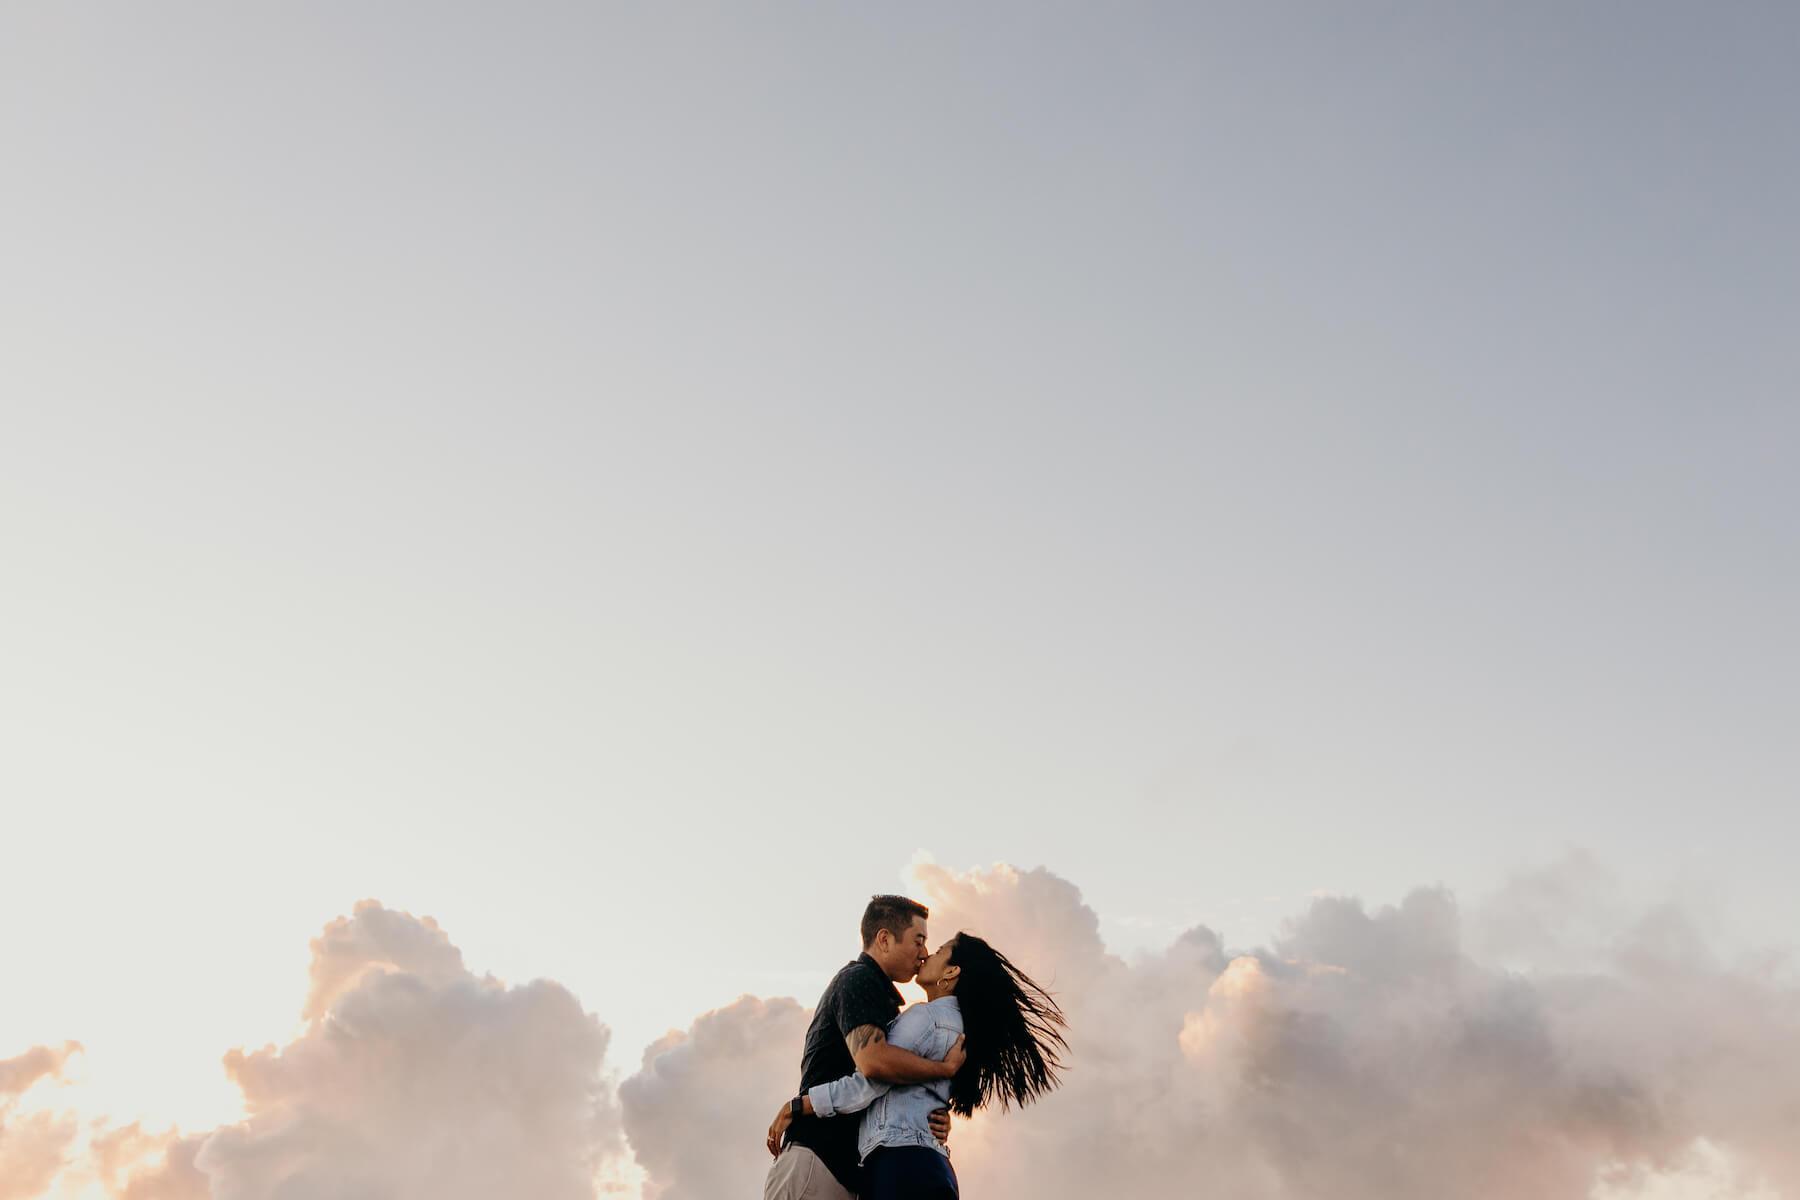 maui-11-09-2019-proposal-41_original